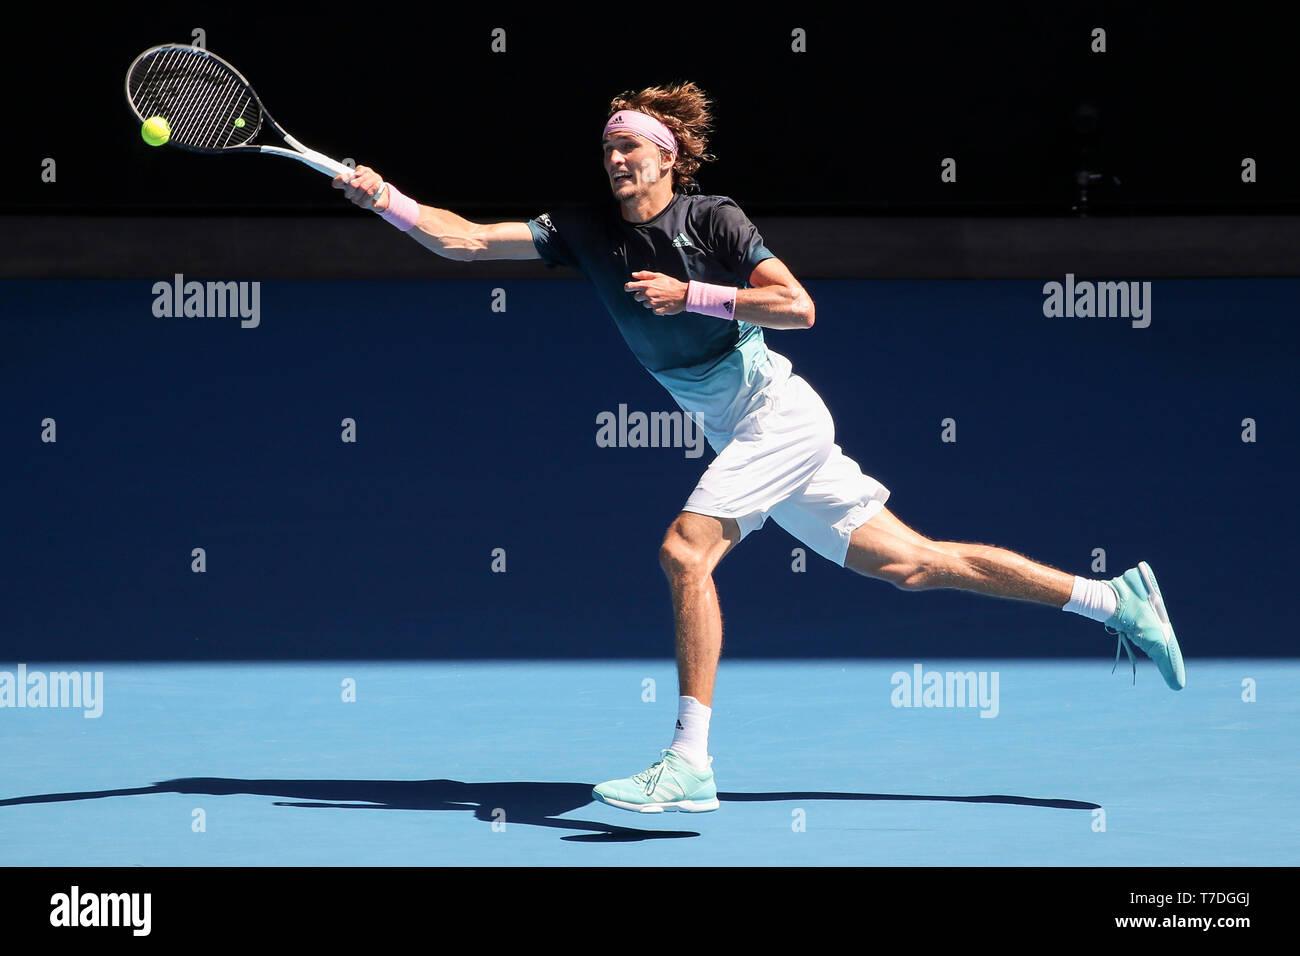 German tennis player Alexander Zverev playing forehand shot in Australian Open 2019 tennis tournament, Melbourne Park, Melbourne, Victoria, Australia - Stock Image